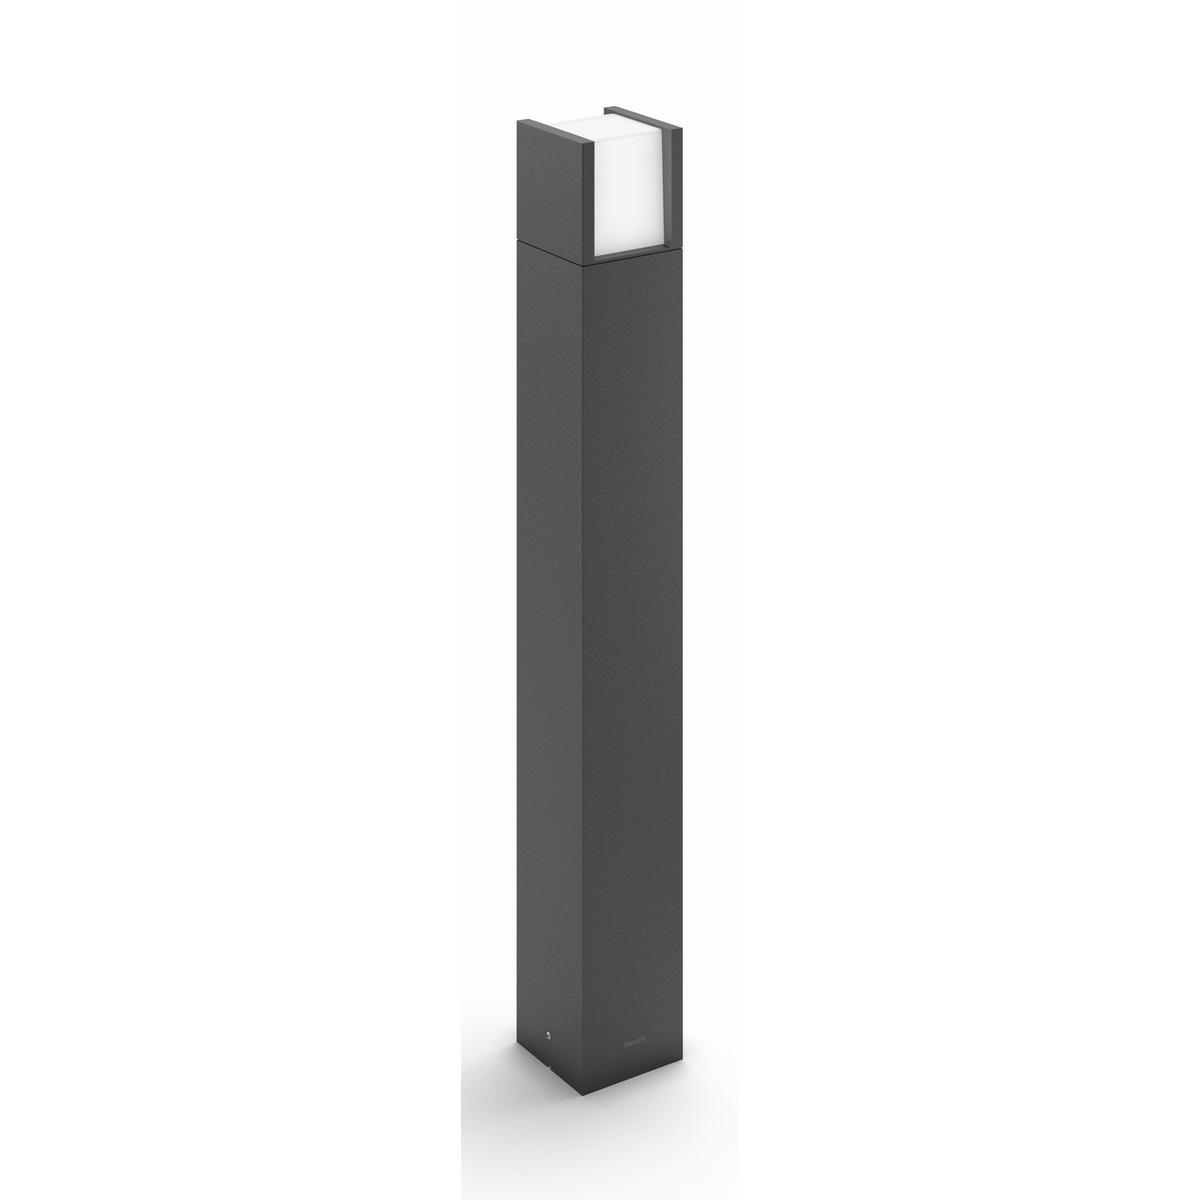 Philips 16463/93/16 Arbour Vonkajšie stĺpikové LED svietidlo 77 cm, antracit